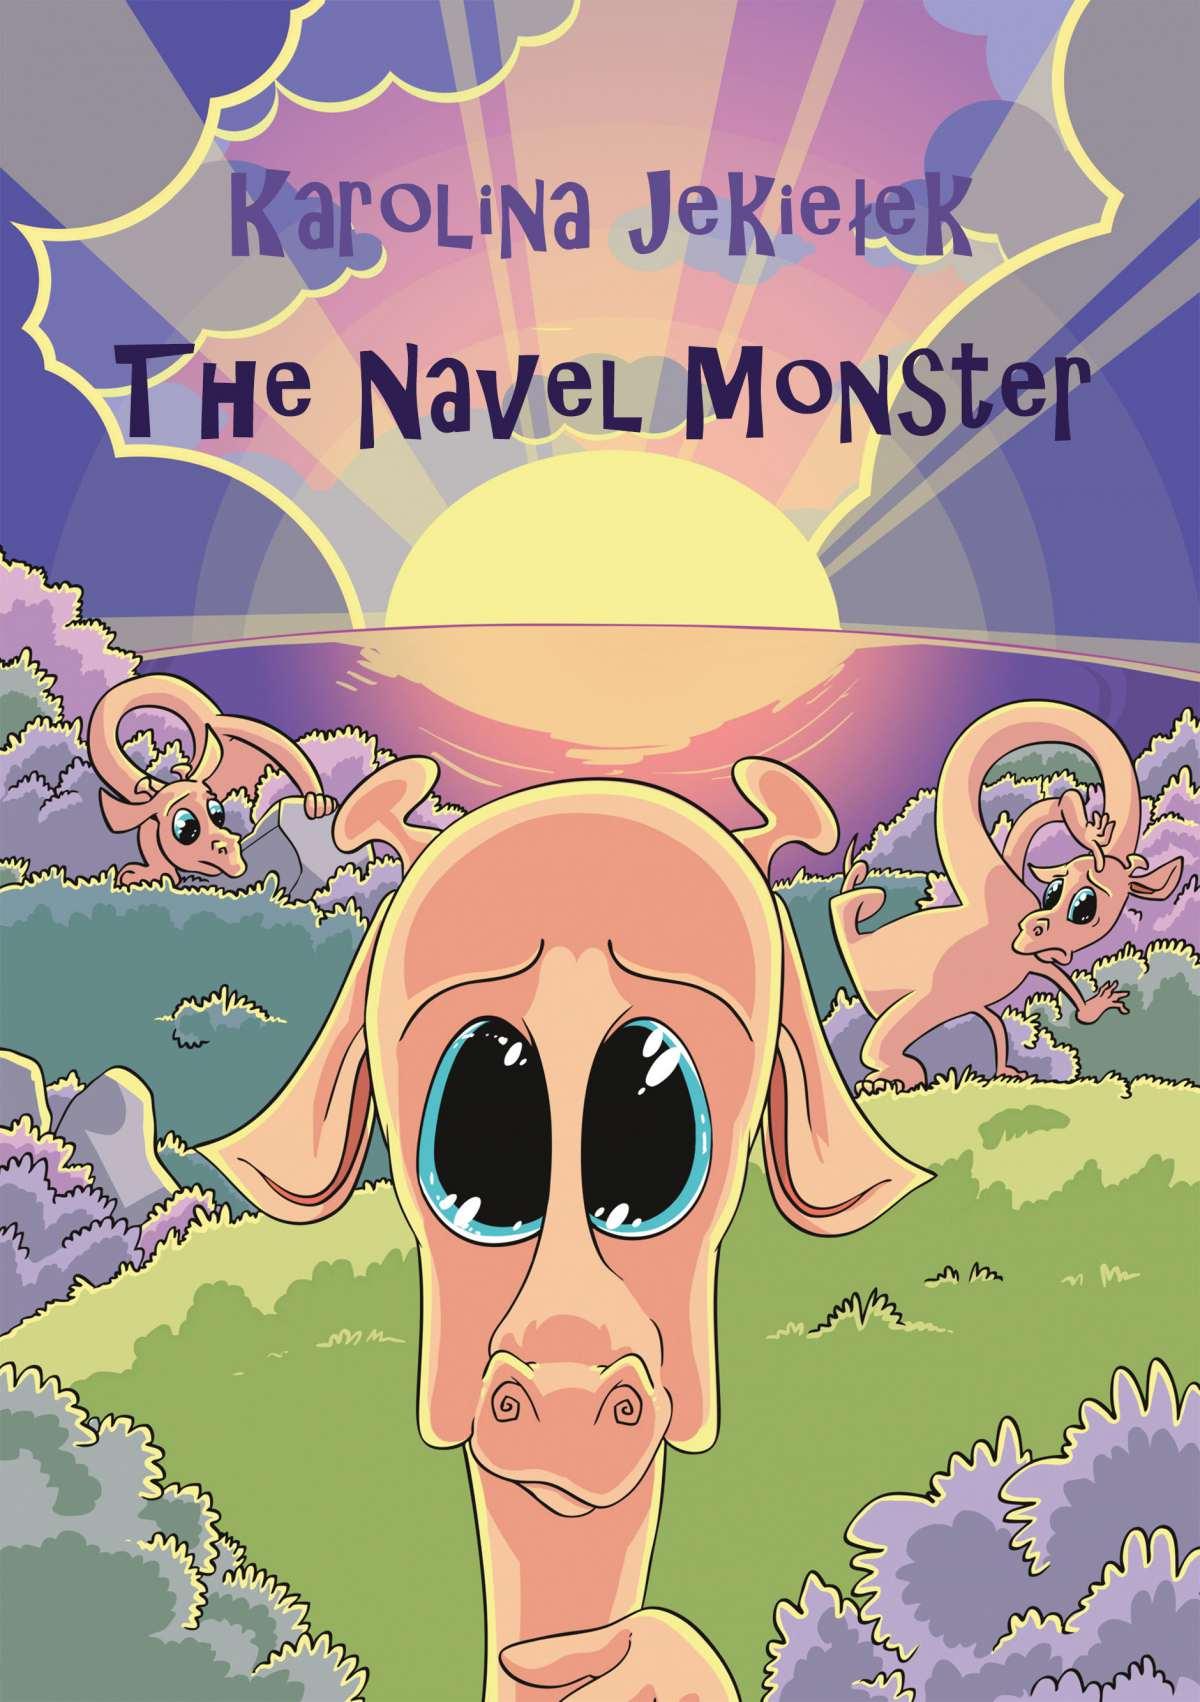 The Navel monster - Karolina Jekiełek